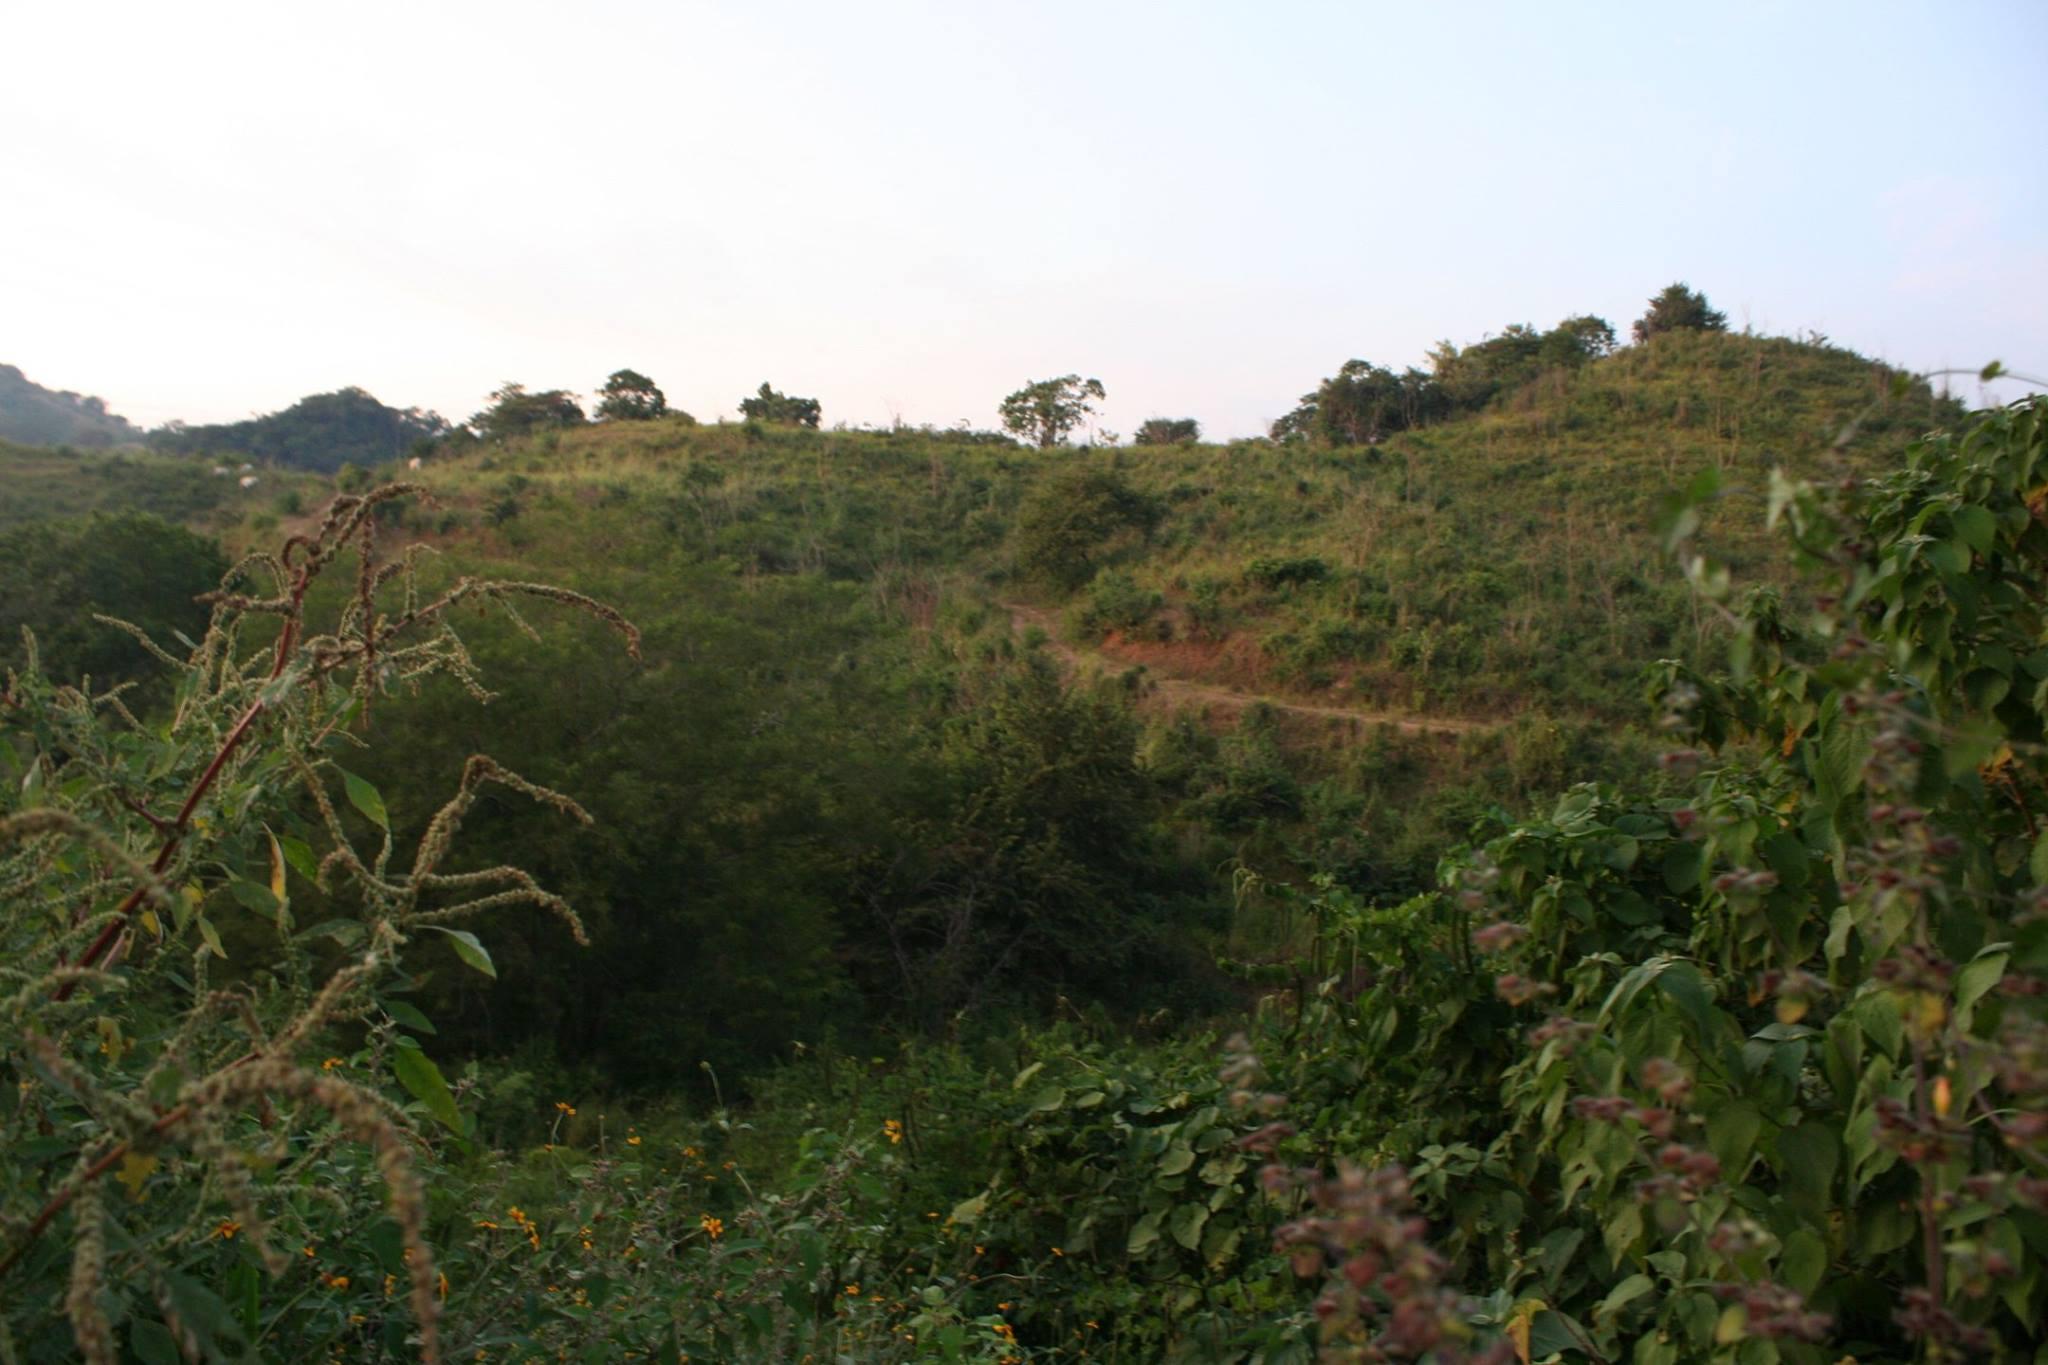 Brachypelma baumgarteni